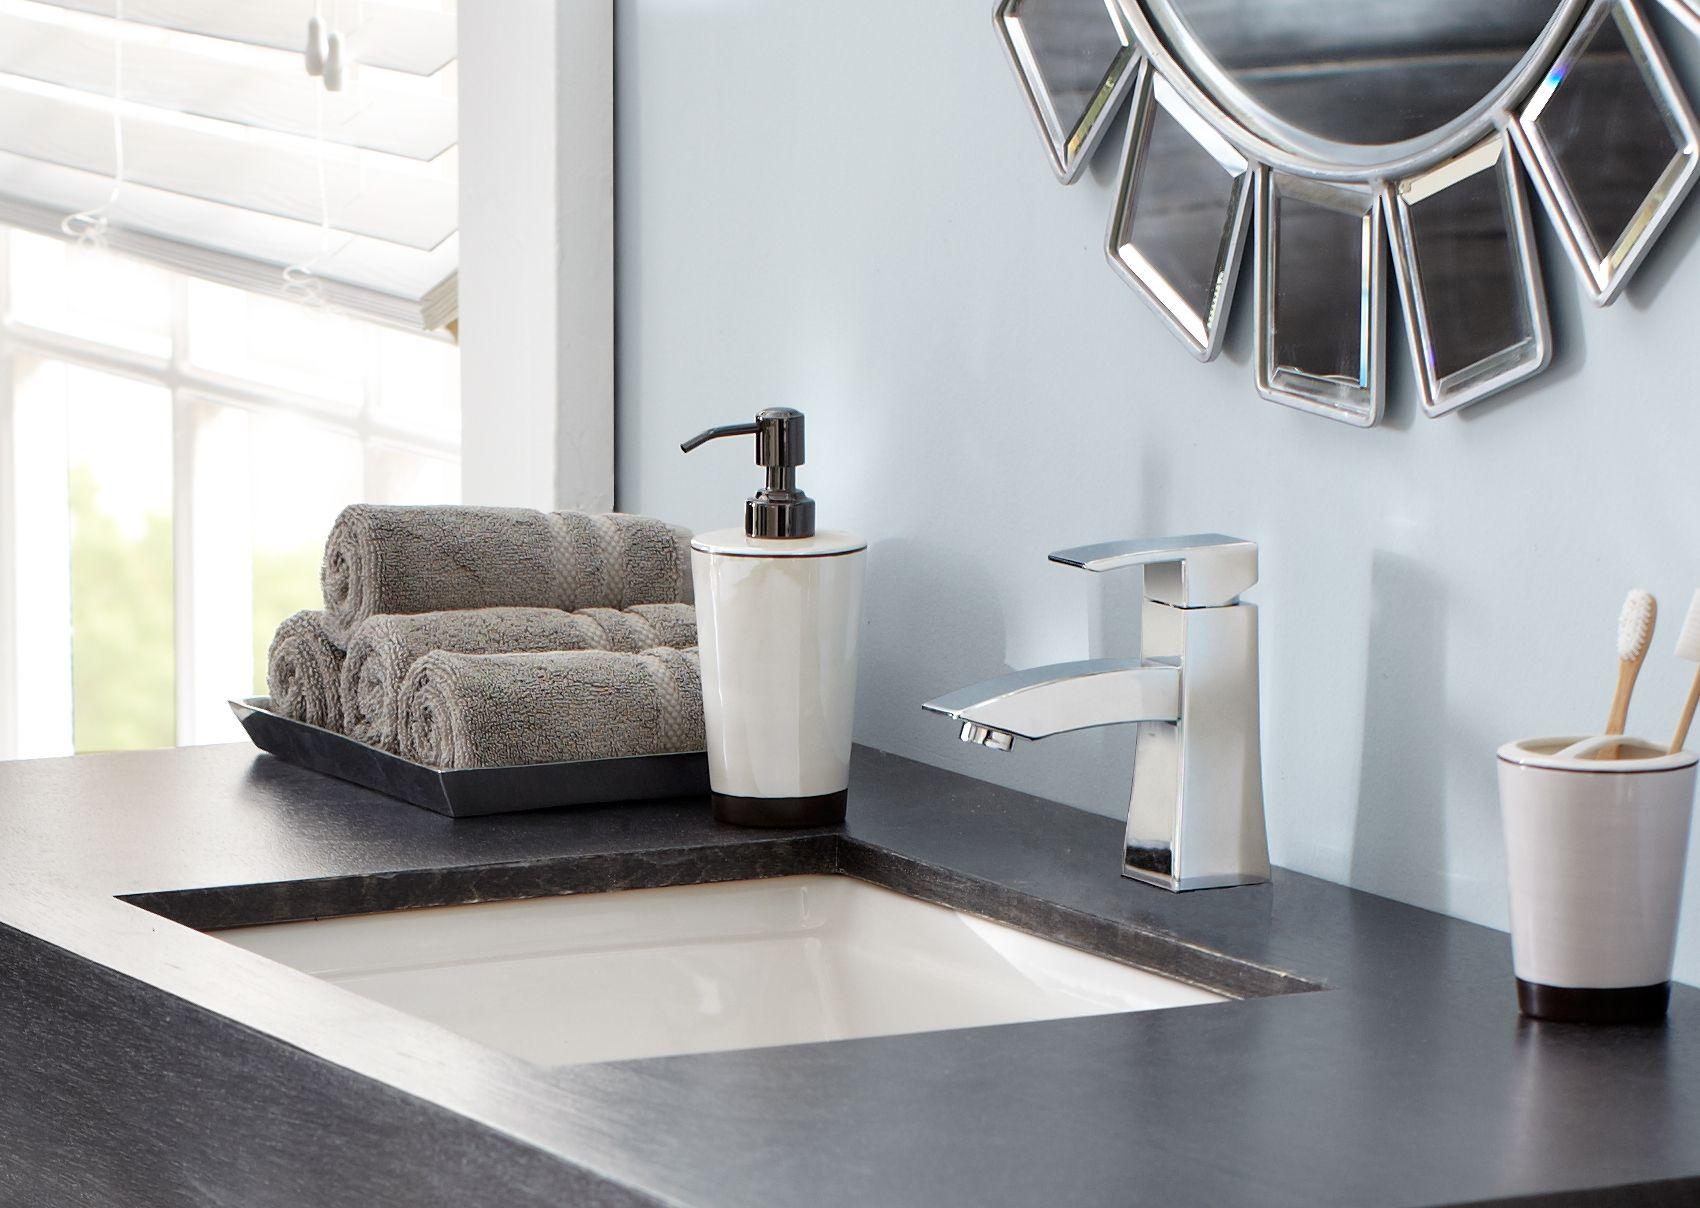 Danze Logan Square single handle faucet | Not just any faucet ...